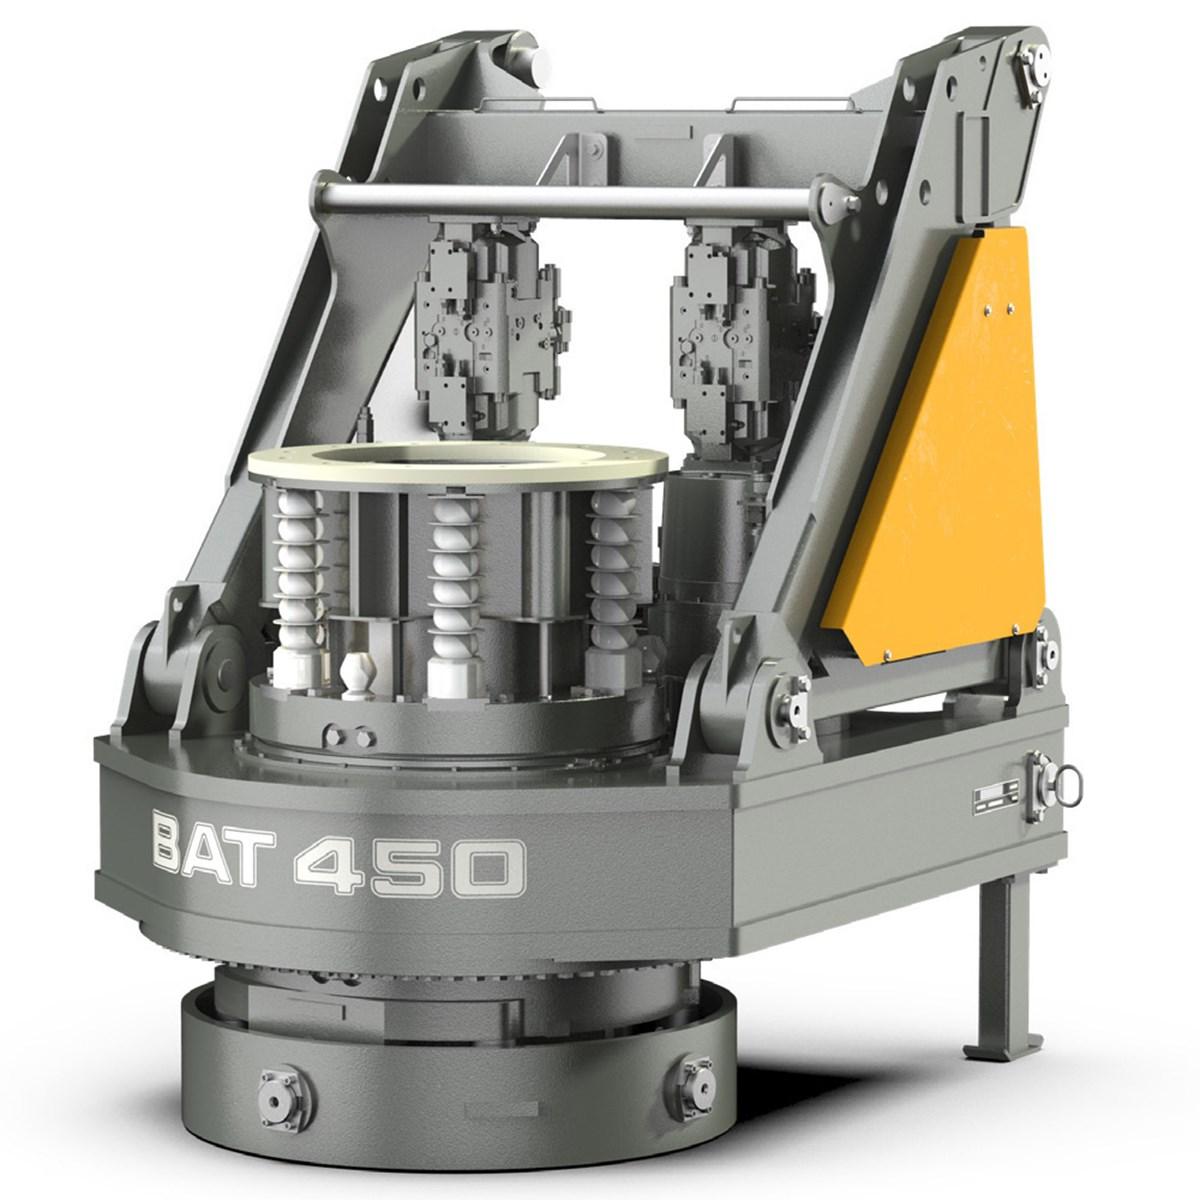 liebherr-bat-450-bohrantrieb-rotary-drive-for-lb-45.jpg